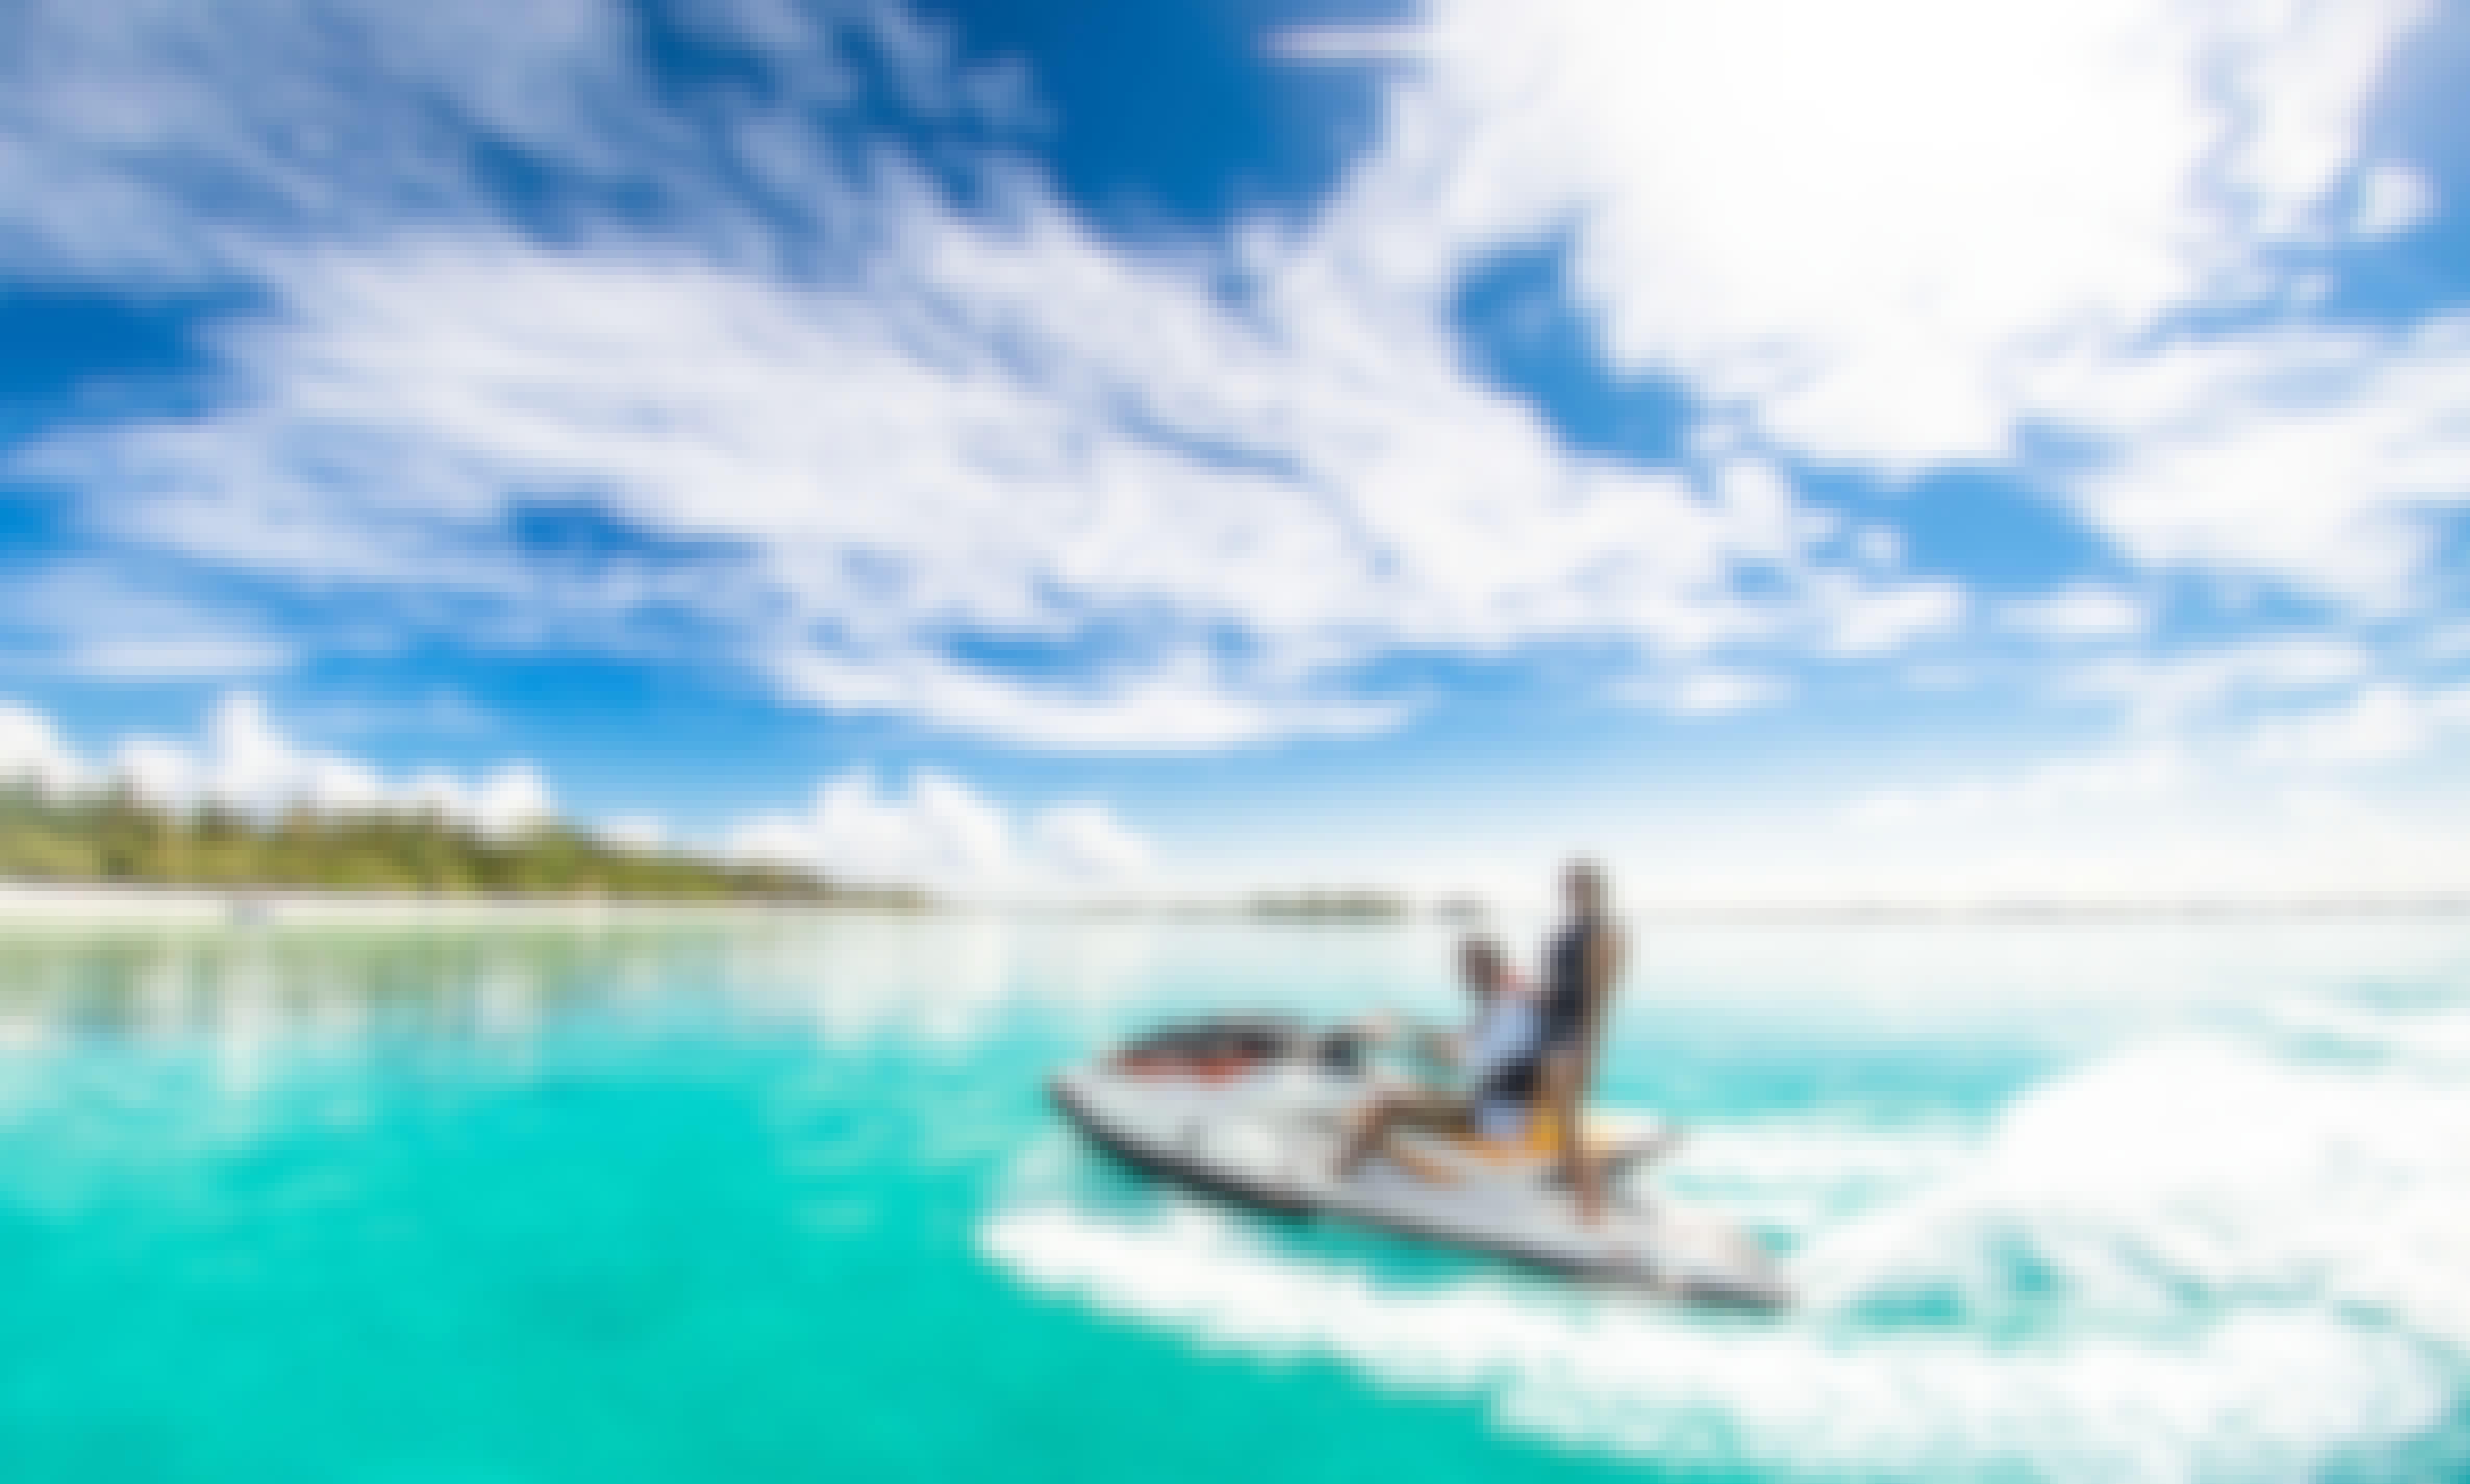 Sea Doo GTI Jet-Ski Rentals for 2 People on Lake Norman, NC